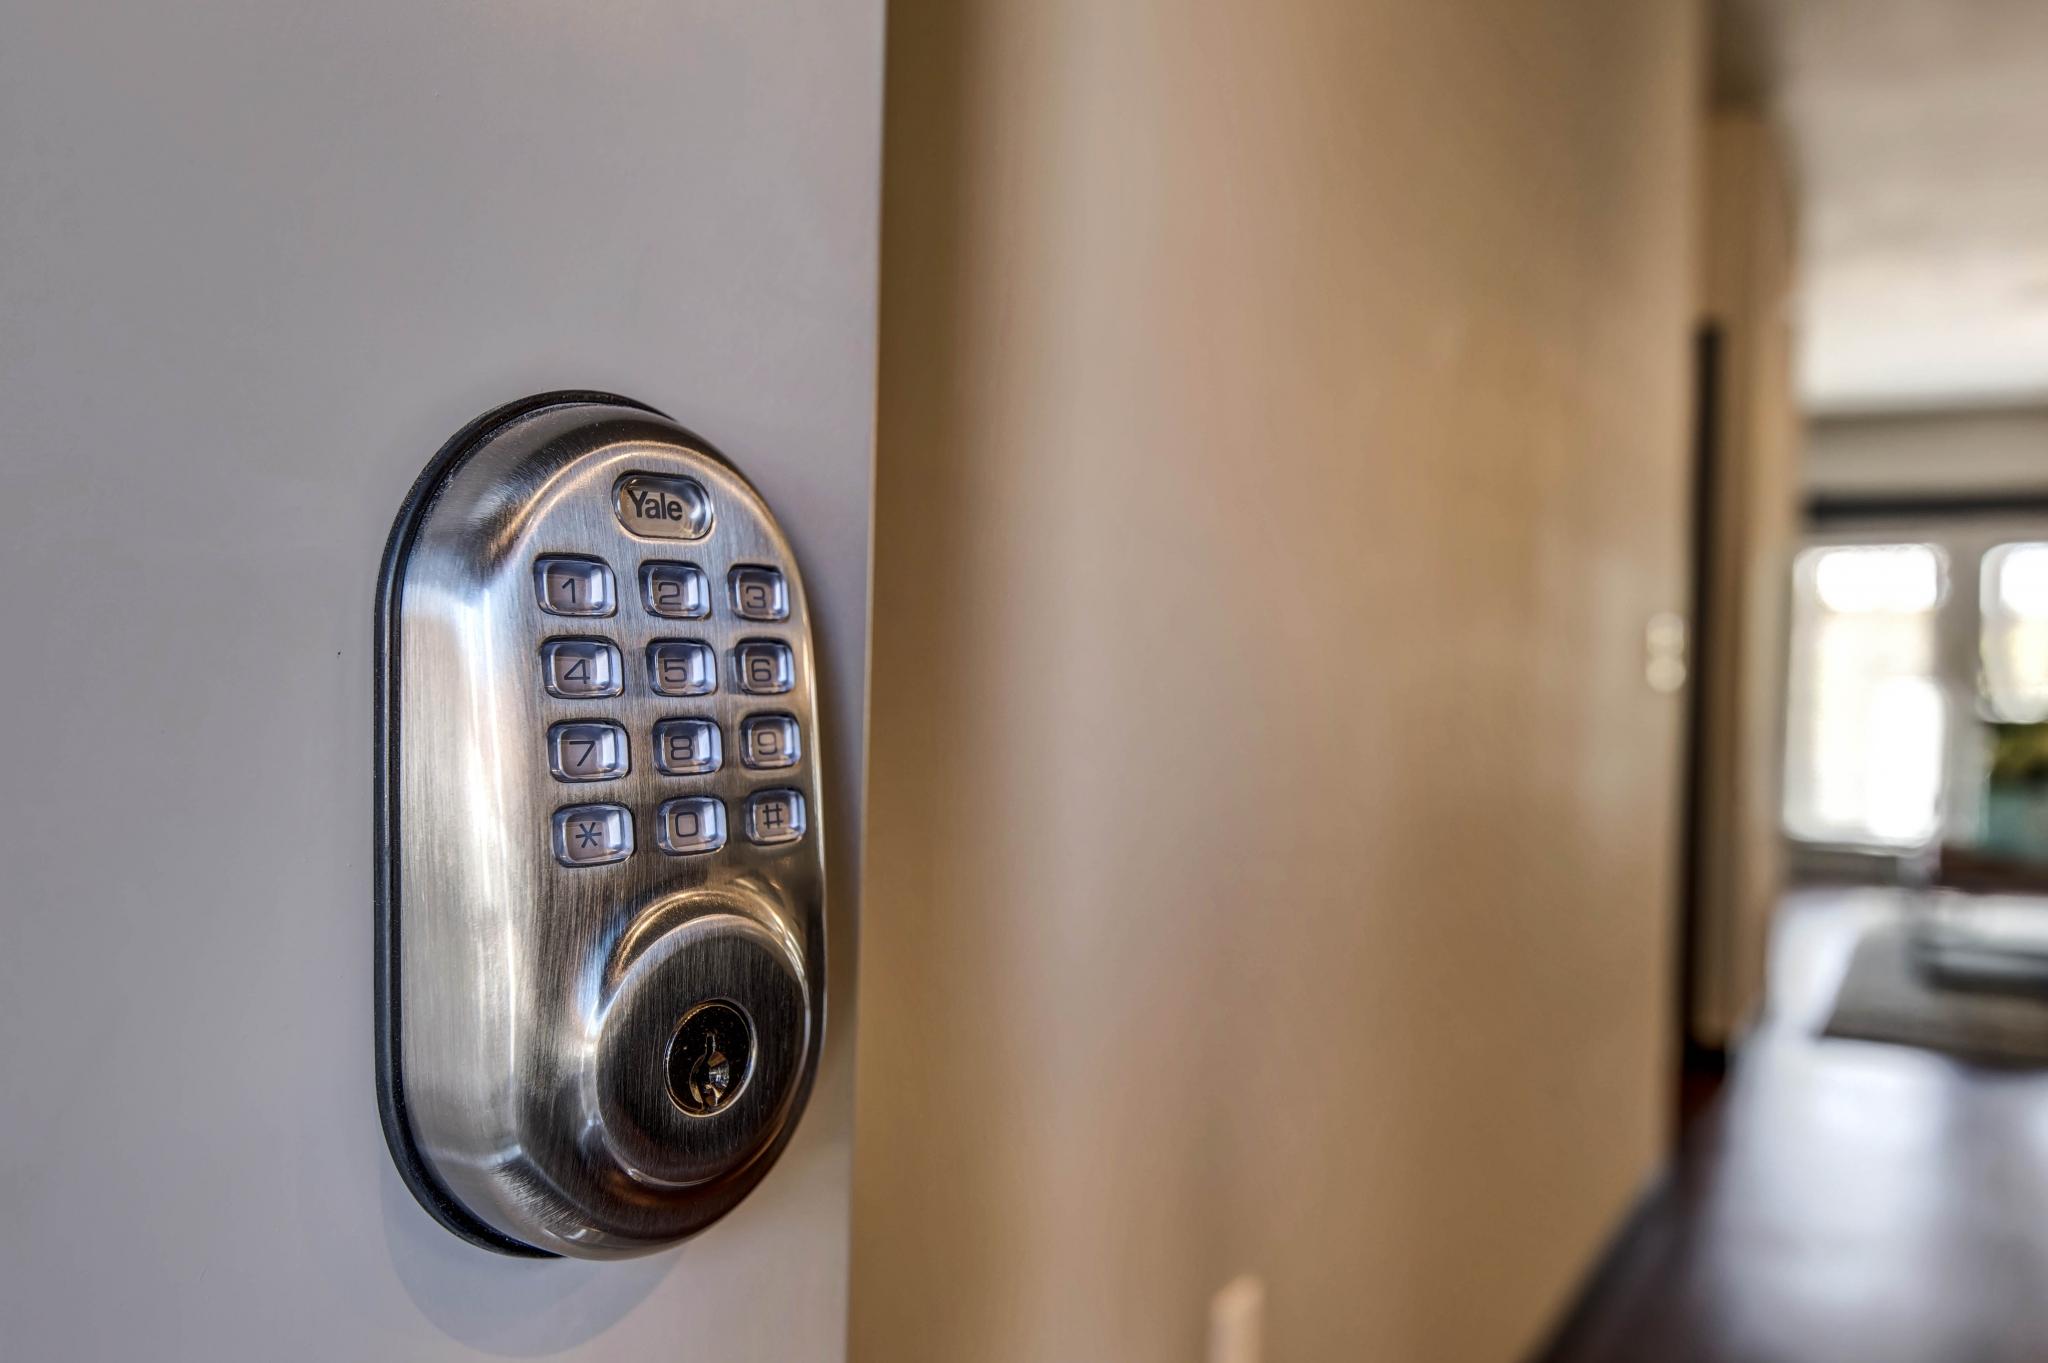 Township 28 Apartments smart technology - keyless entry